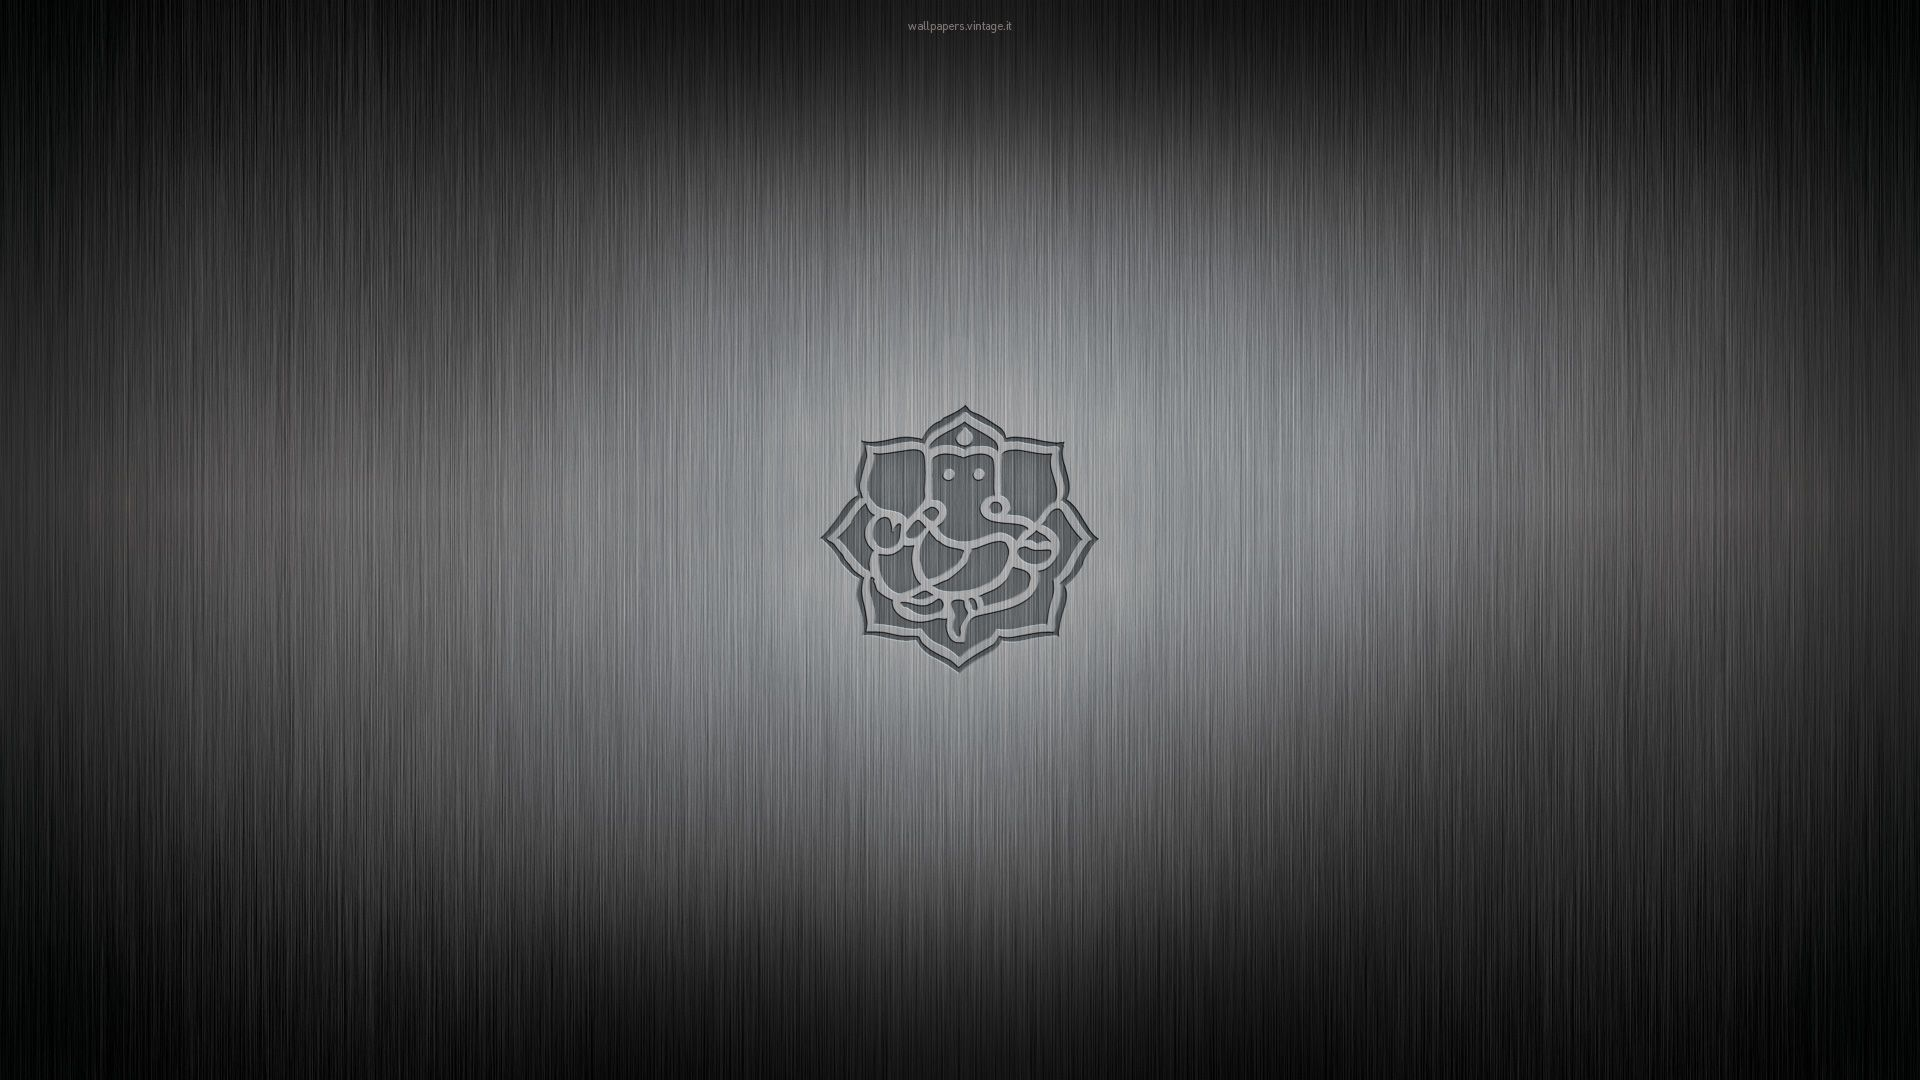 Ganesha Wallpaper Free Desktop Hd Ipad Iphone Wallpapers Ganesh Wallpaper Wallpaper Ganesha